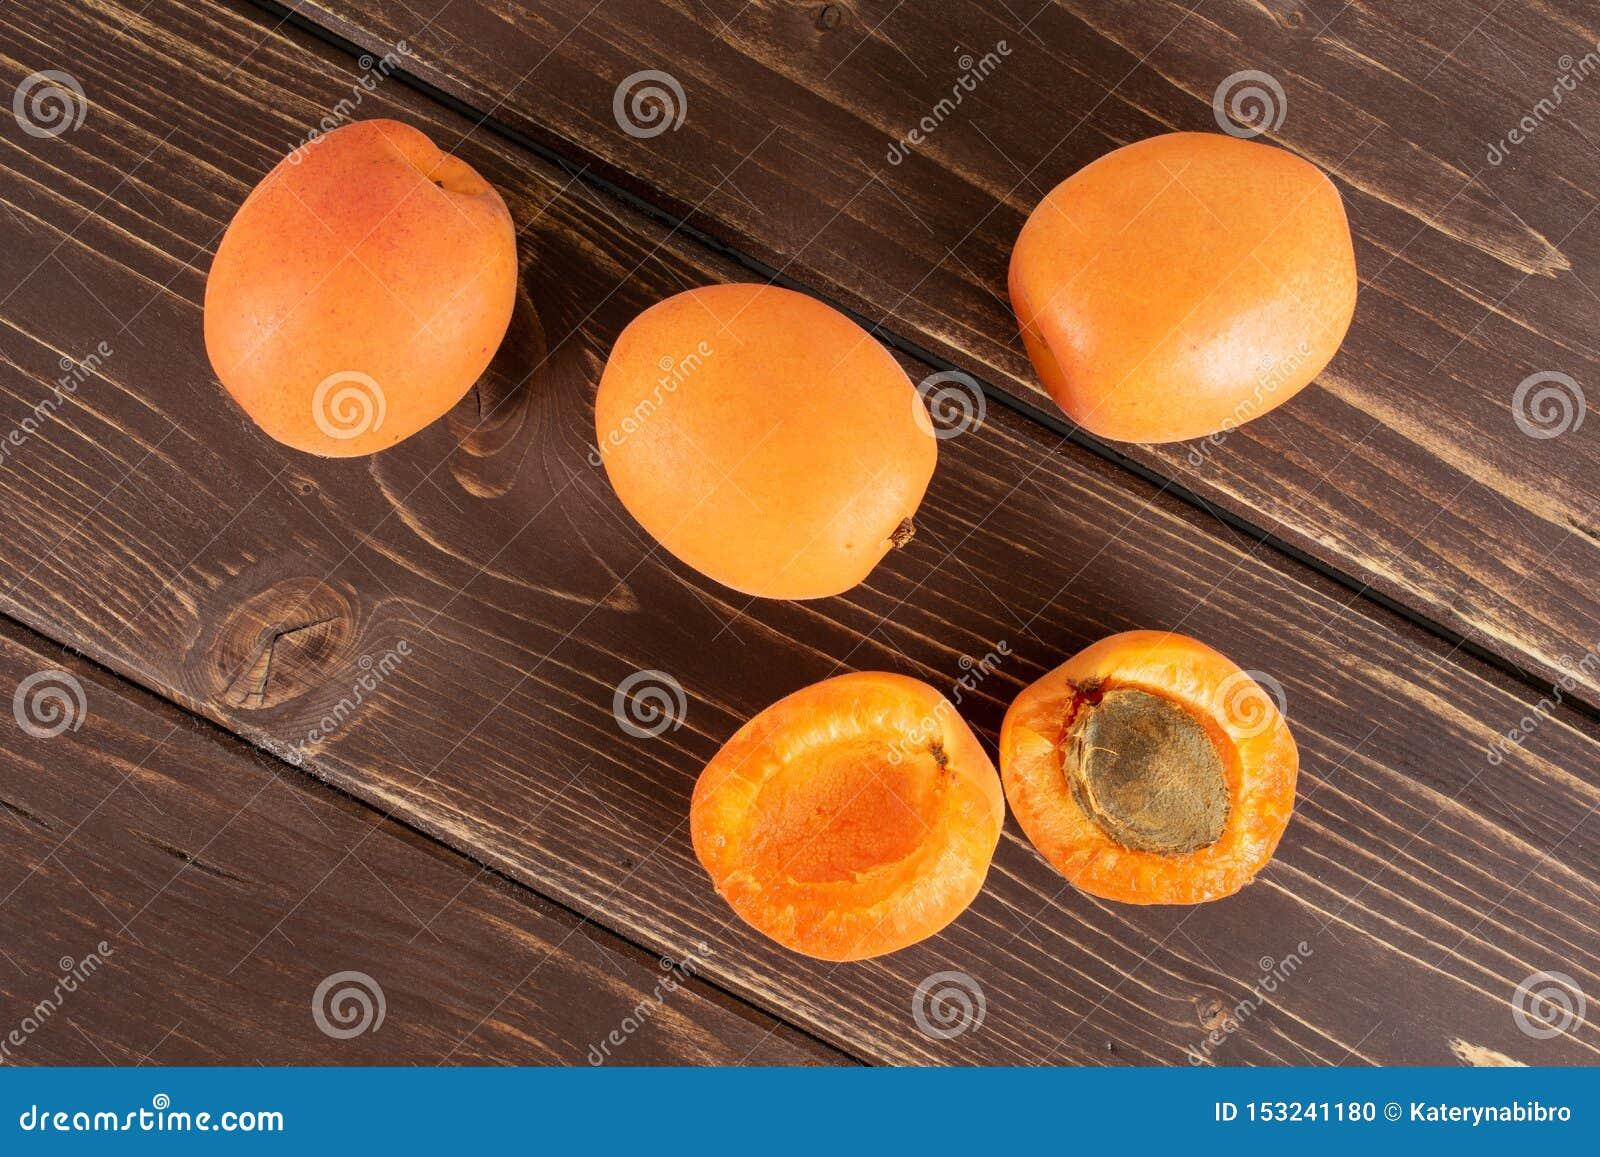 Fresh orange apricot on brown wood